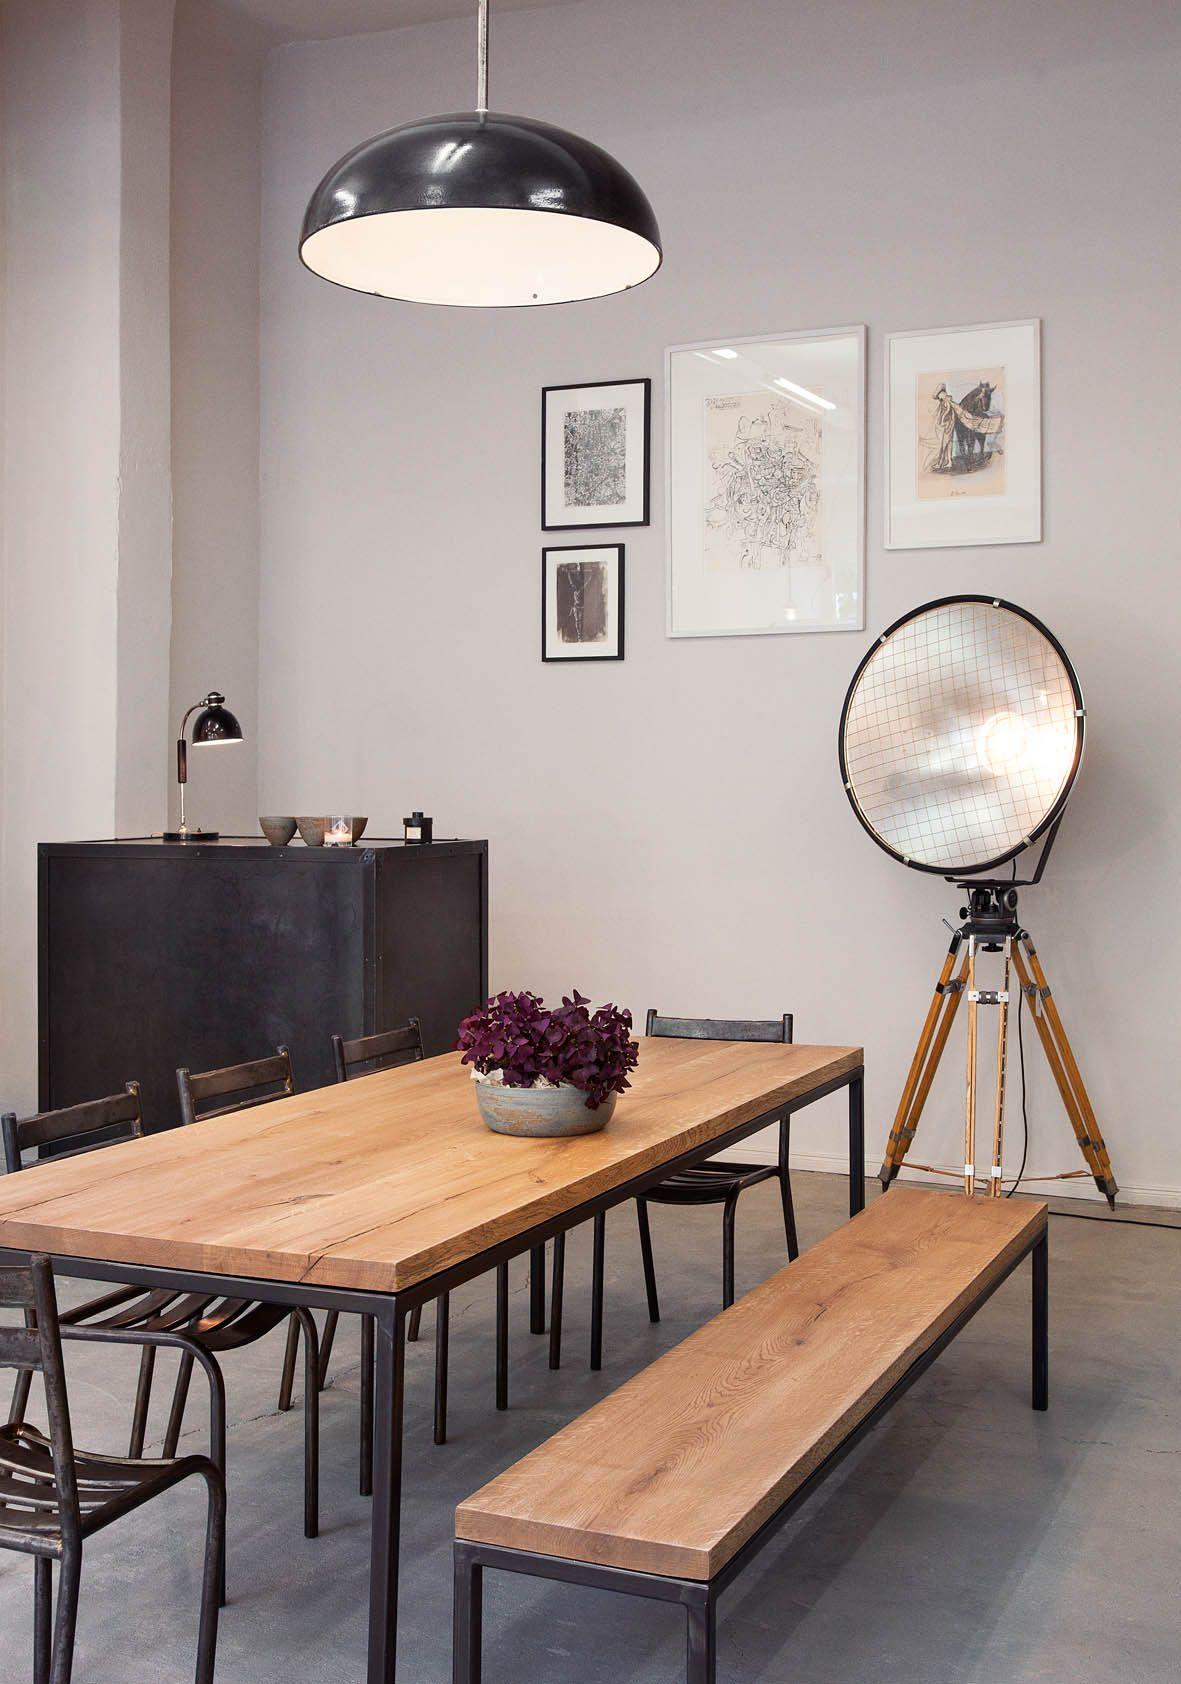 maison gro e sch ne esstische aus massivholz von objets trouv s e15 co hochzeitsberg. Black Bedroom Furniture Sets. Home Design Ideas